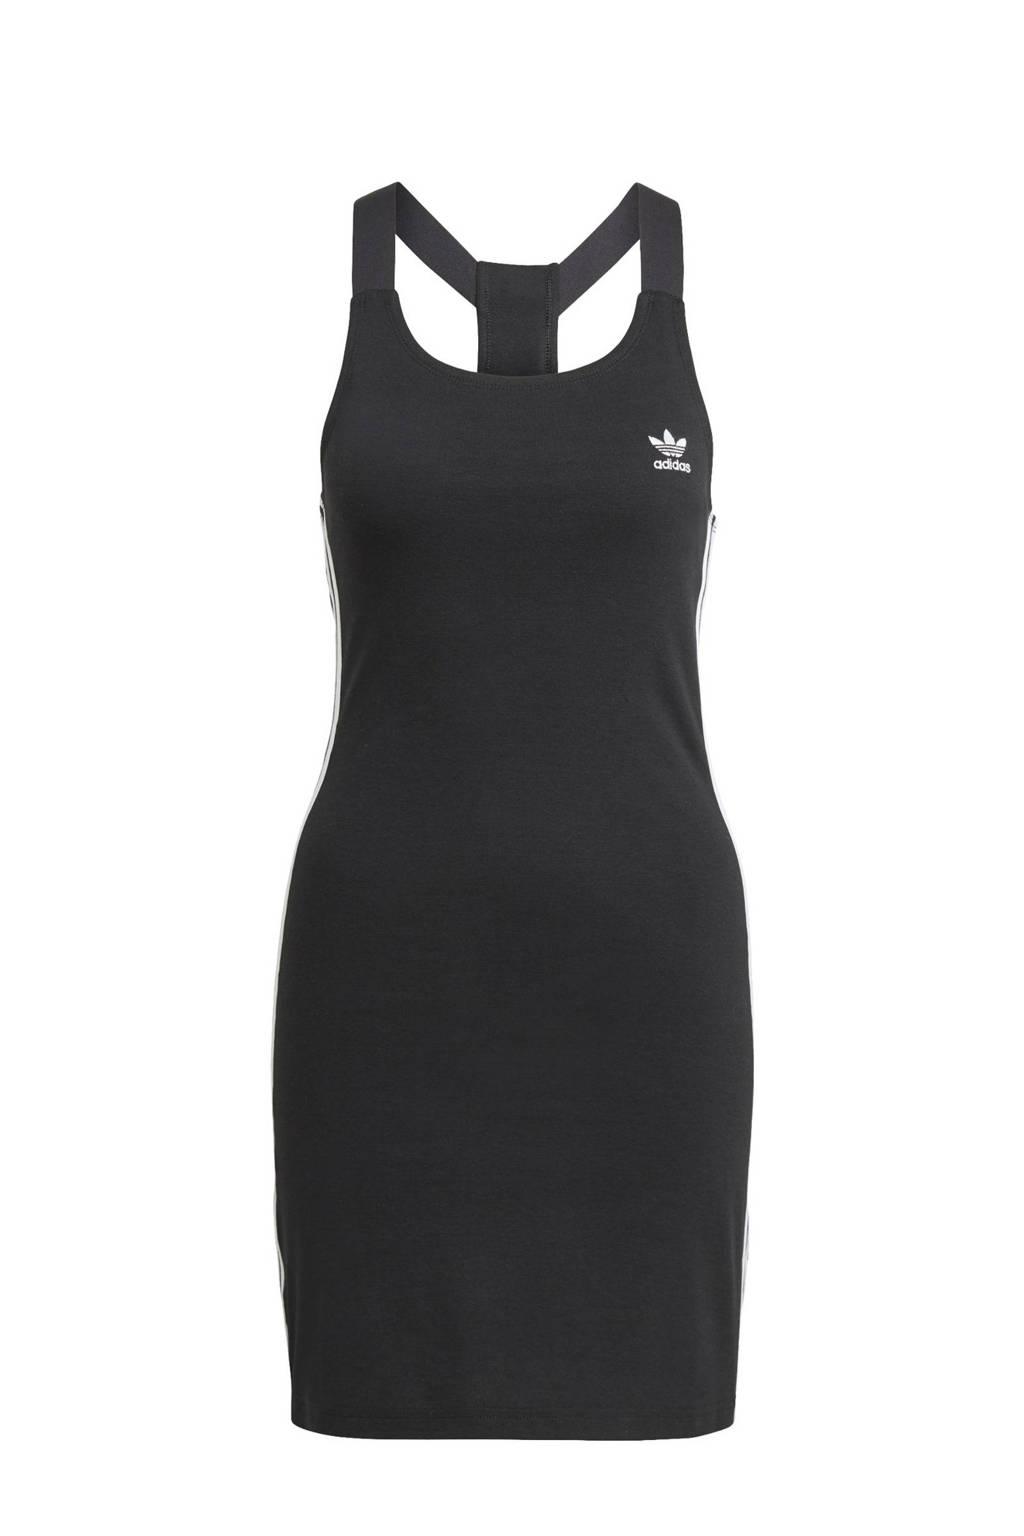 adidas Originals Adicolor jurk zwart/wit, Zwart/wit